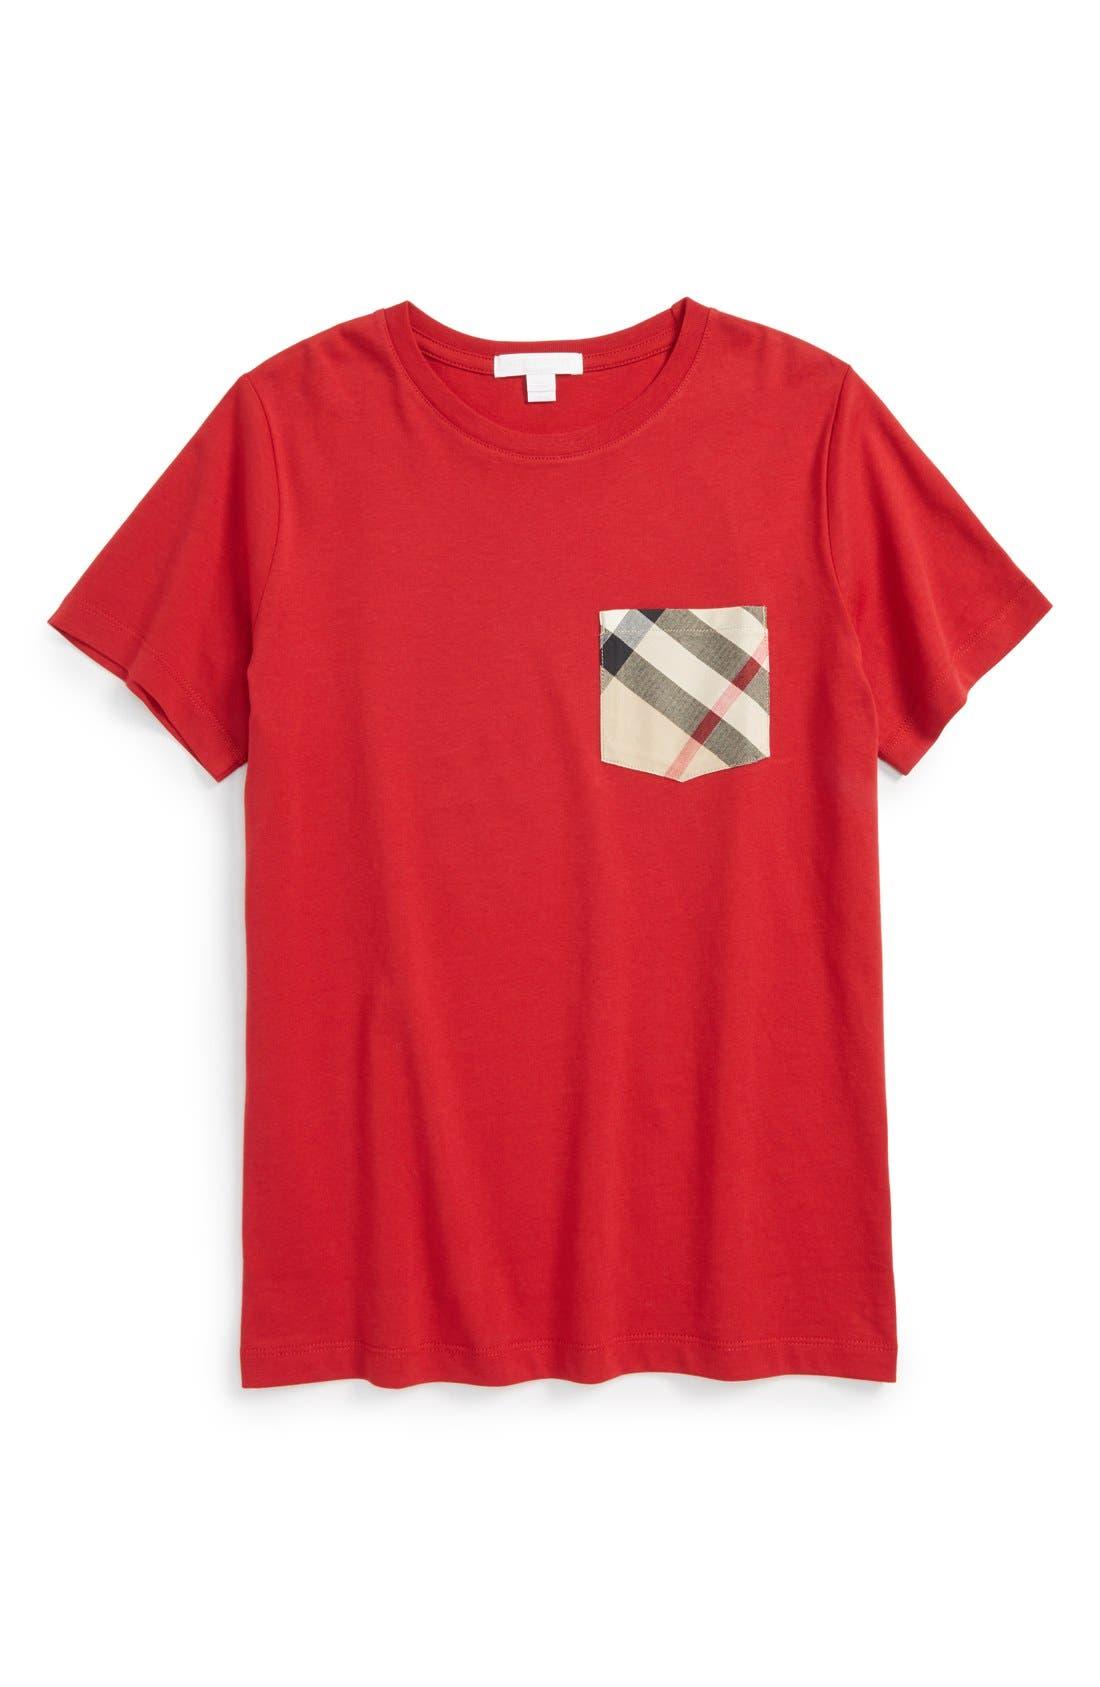 Alternate Image 1 Selected - Burberry Contrast Pocket T-Shirt (Little Boys & Big Boys)